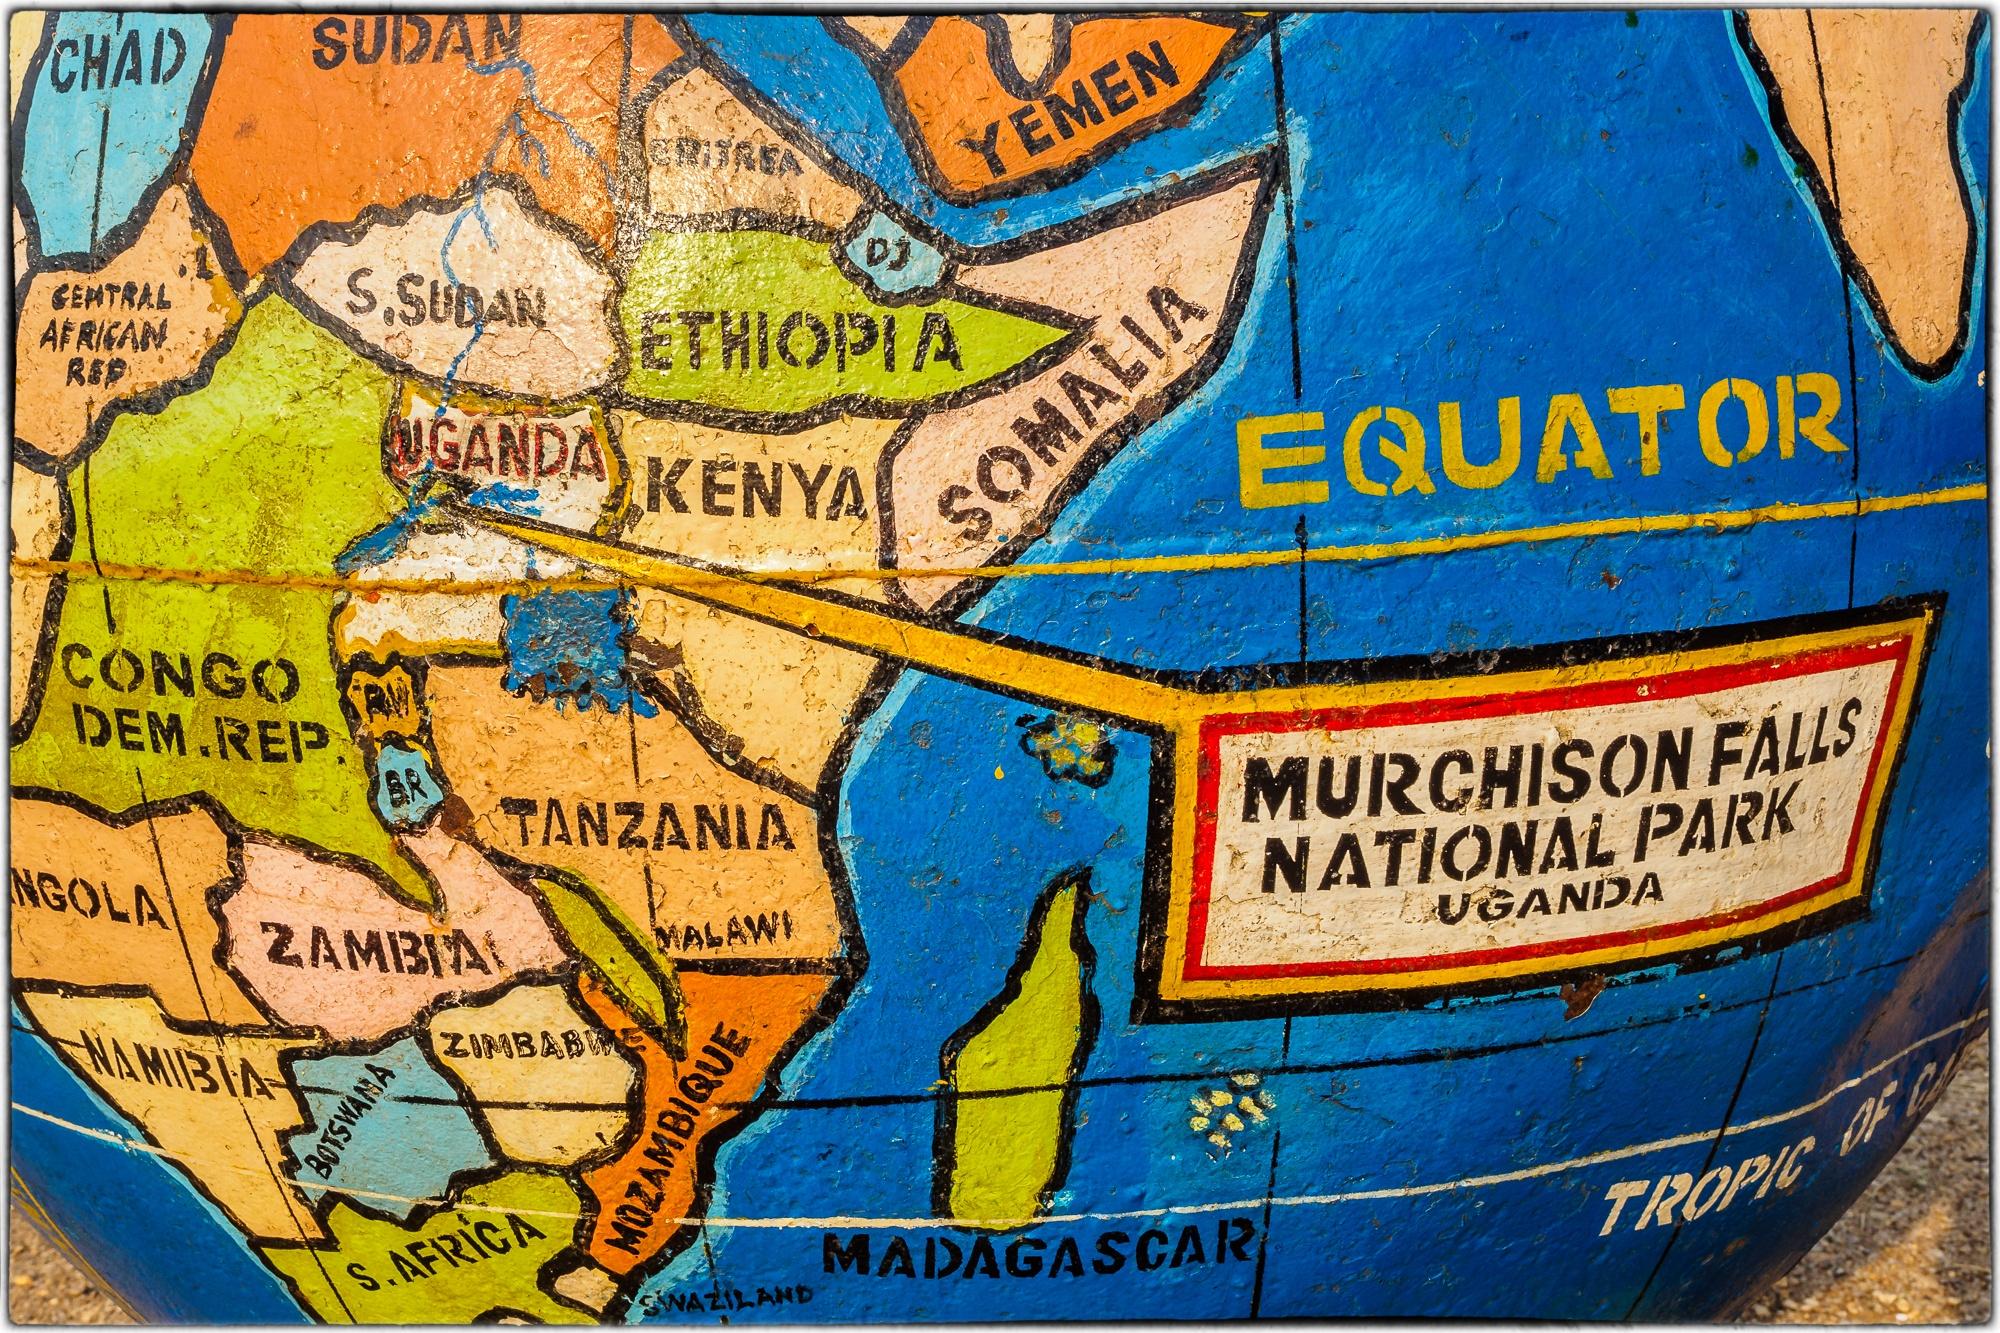 hier ist der Murchison Falls Nationalpark